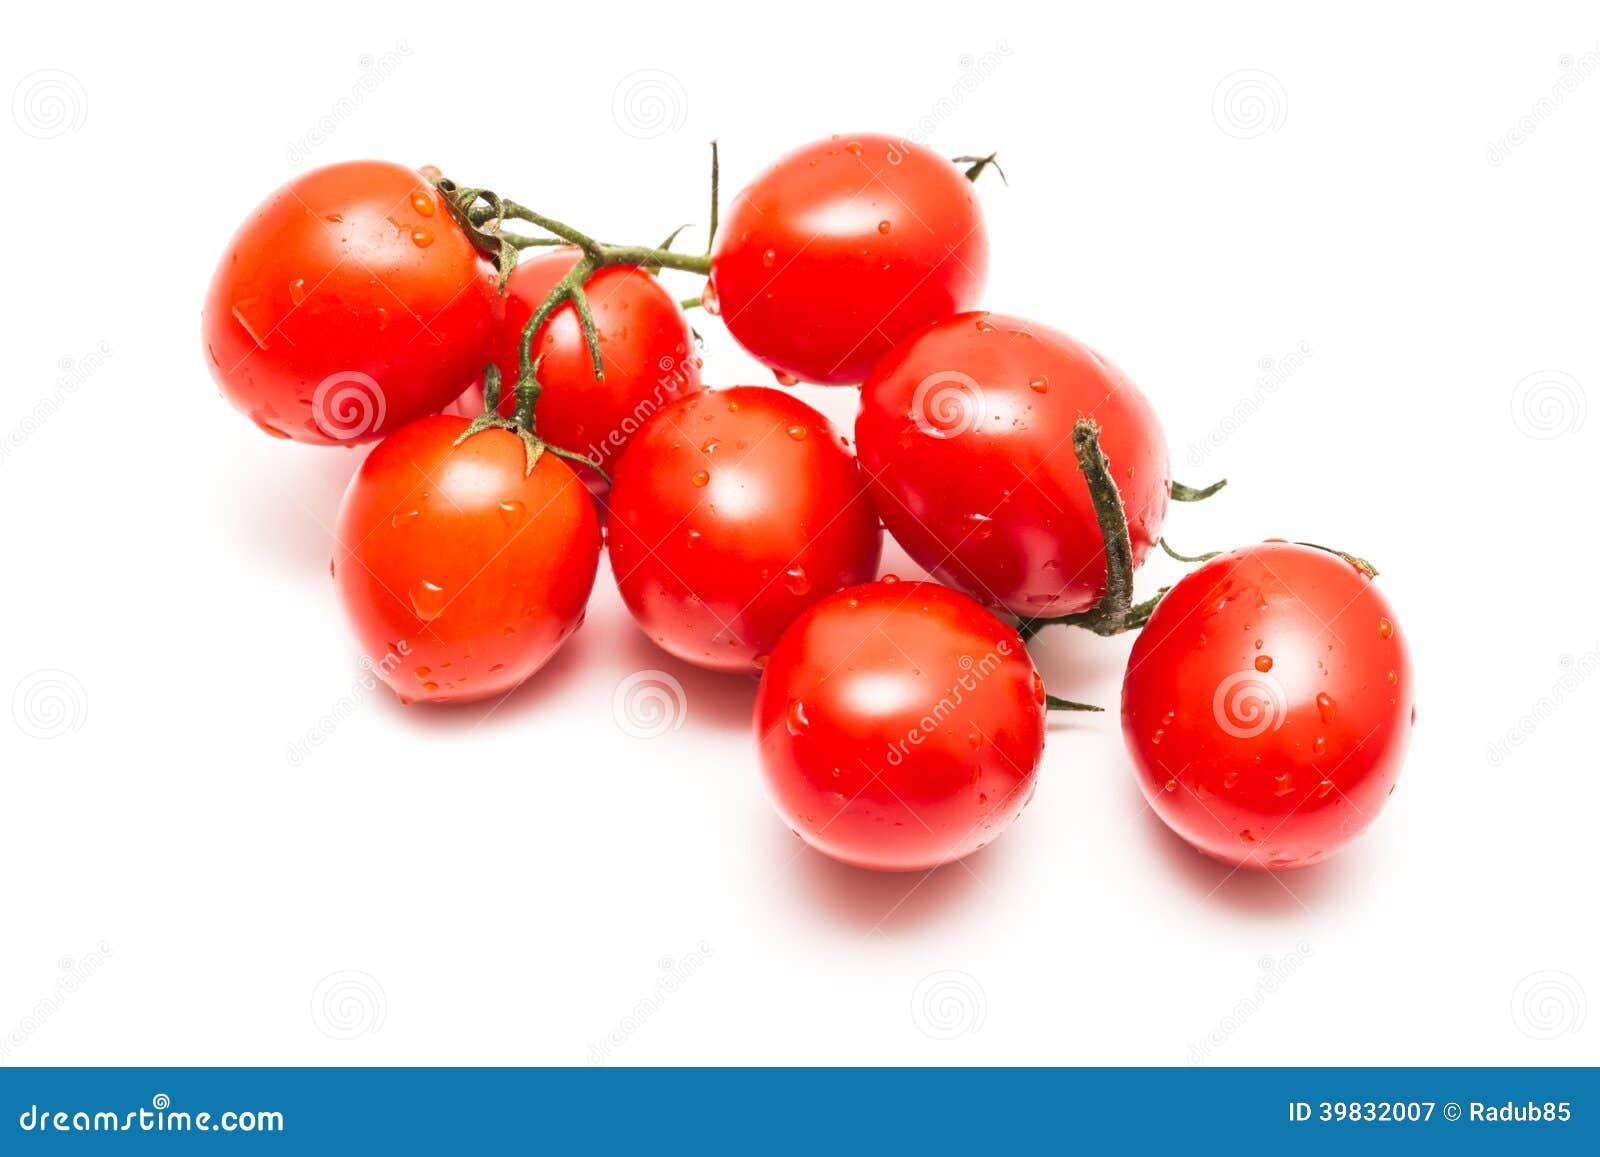 Fresh Wet Red Tomatoes Stock Photo - Image: 39832007